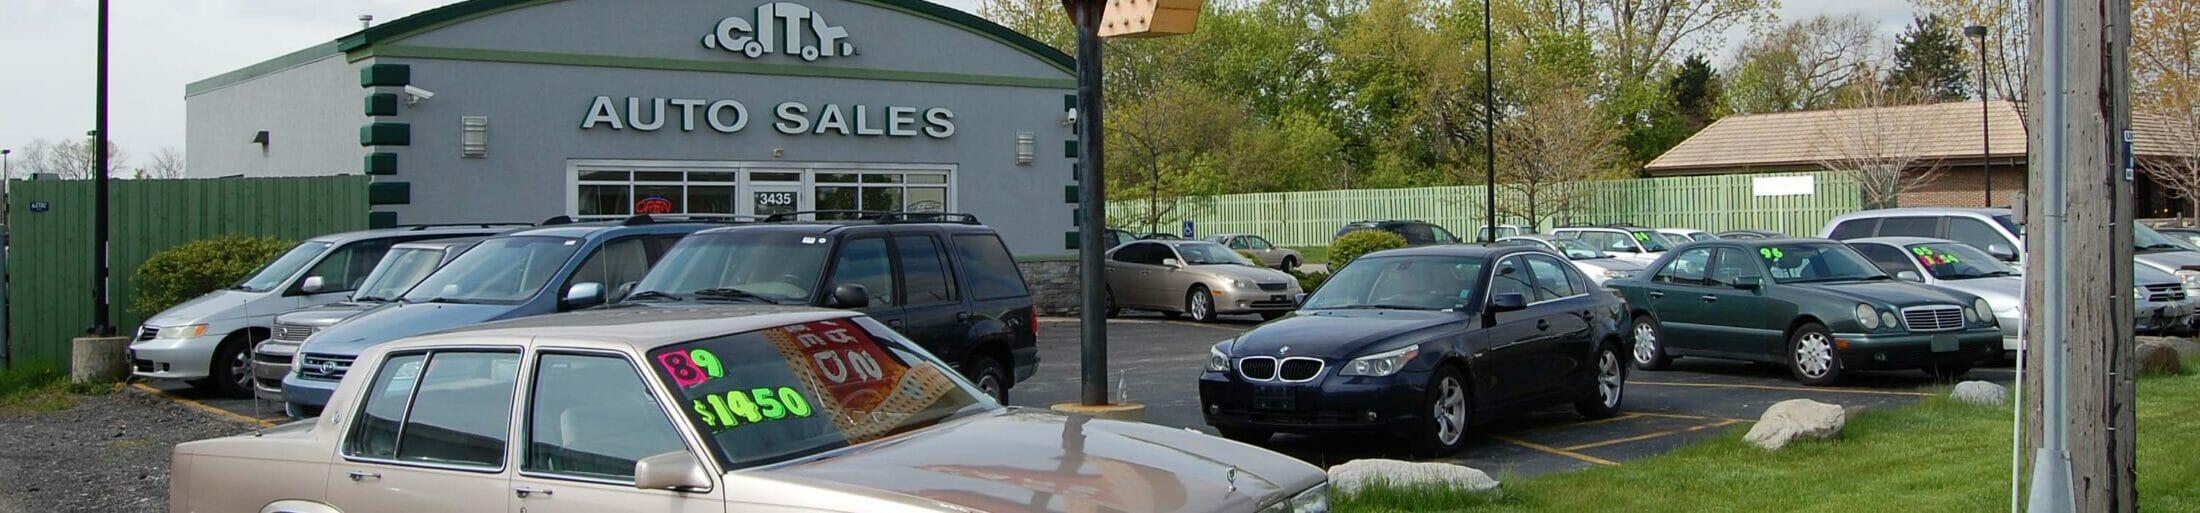 We Buy Junk Cars Auto Parts City Auto Salvage Yards Near Me